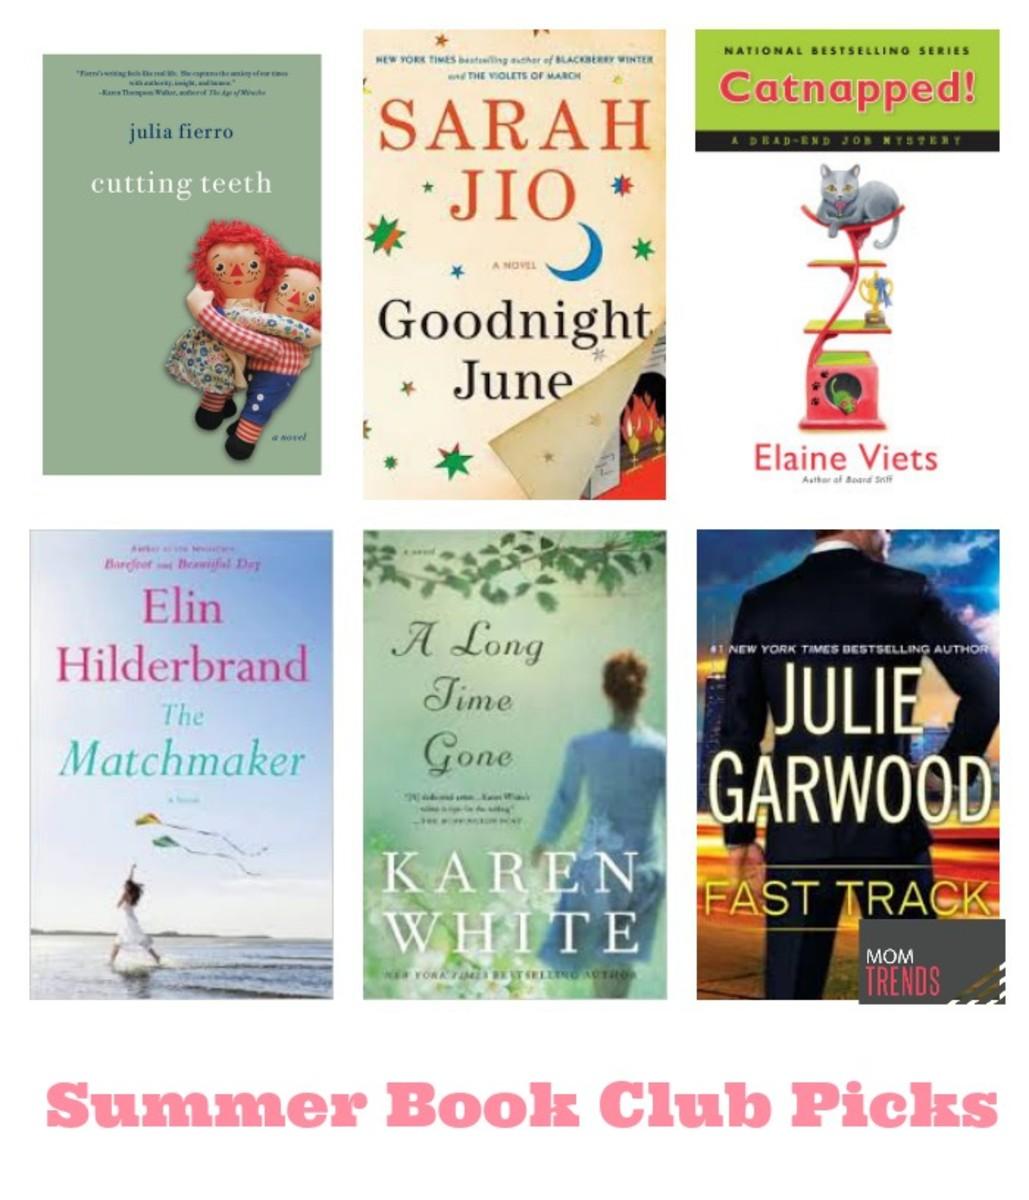 Summer Book Club Picks.jpg.jpg